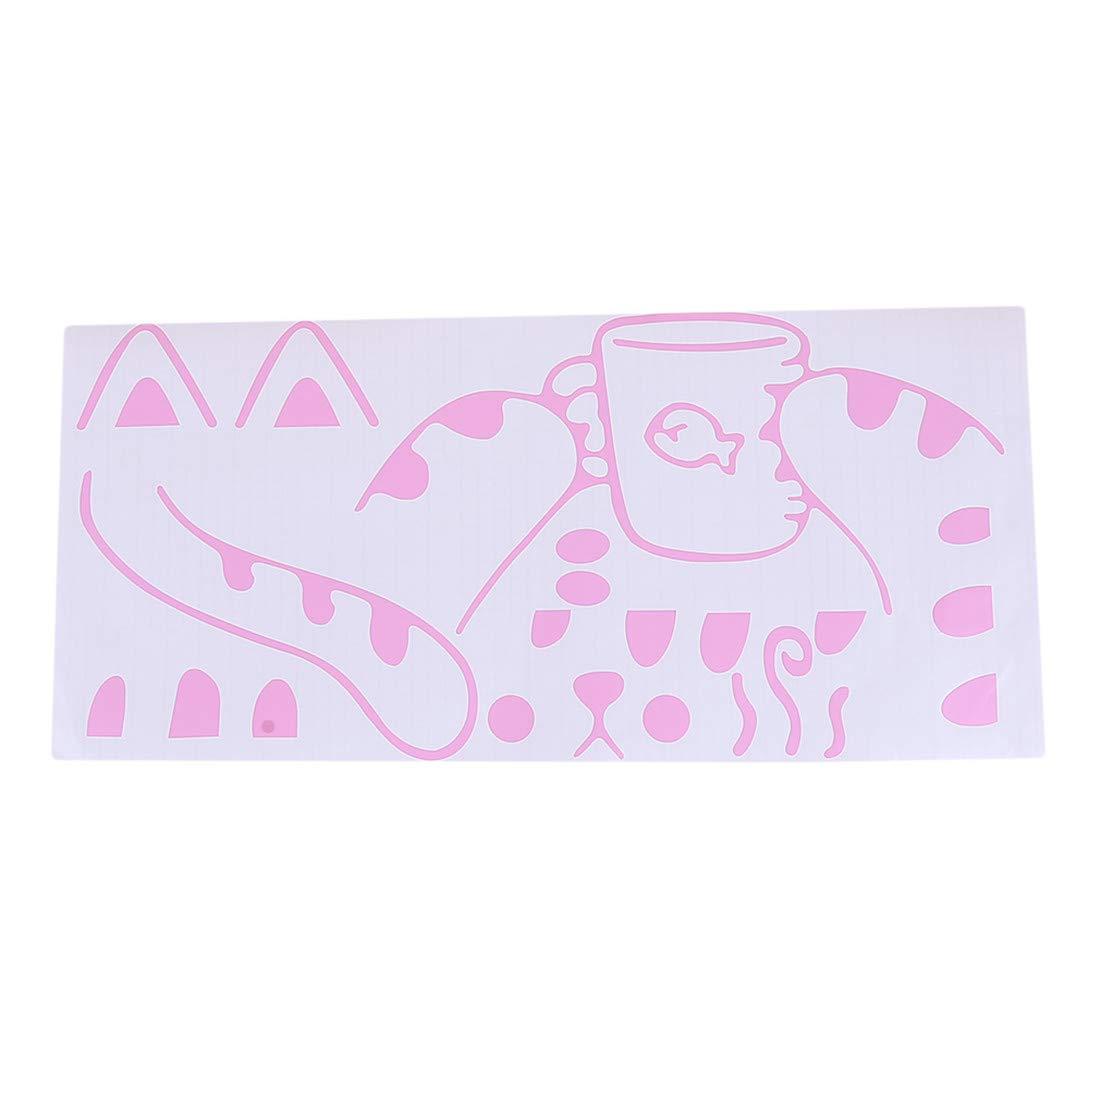 Pink Yingwei VWH Cat Wall Sticker Mural Art Decor for Kids Children Bedroom Decorartion